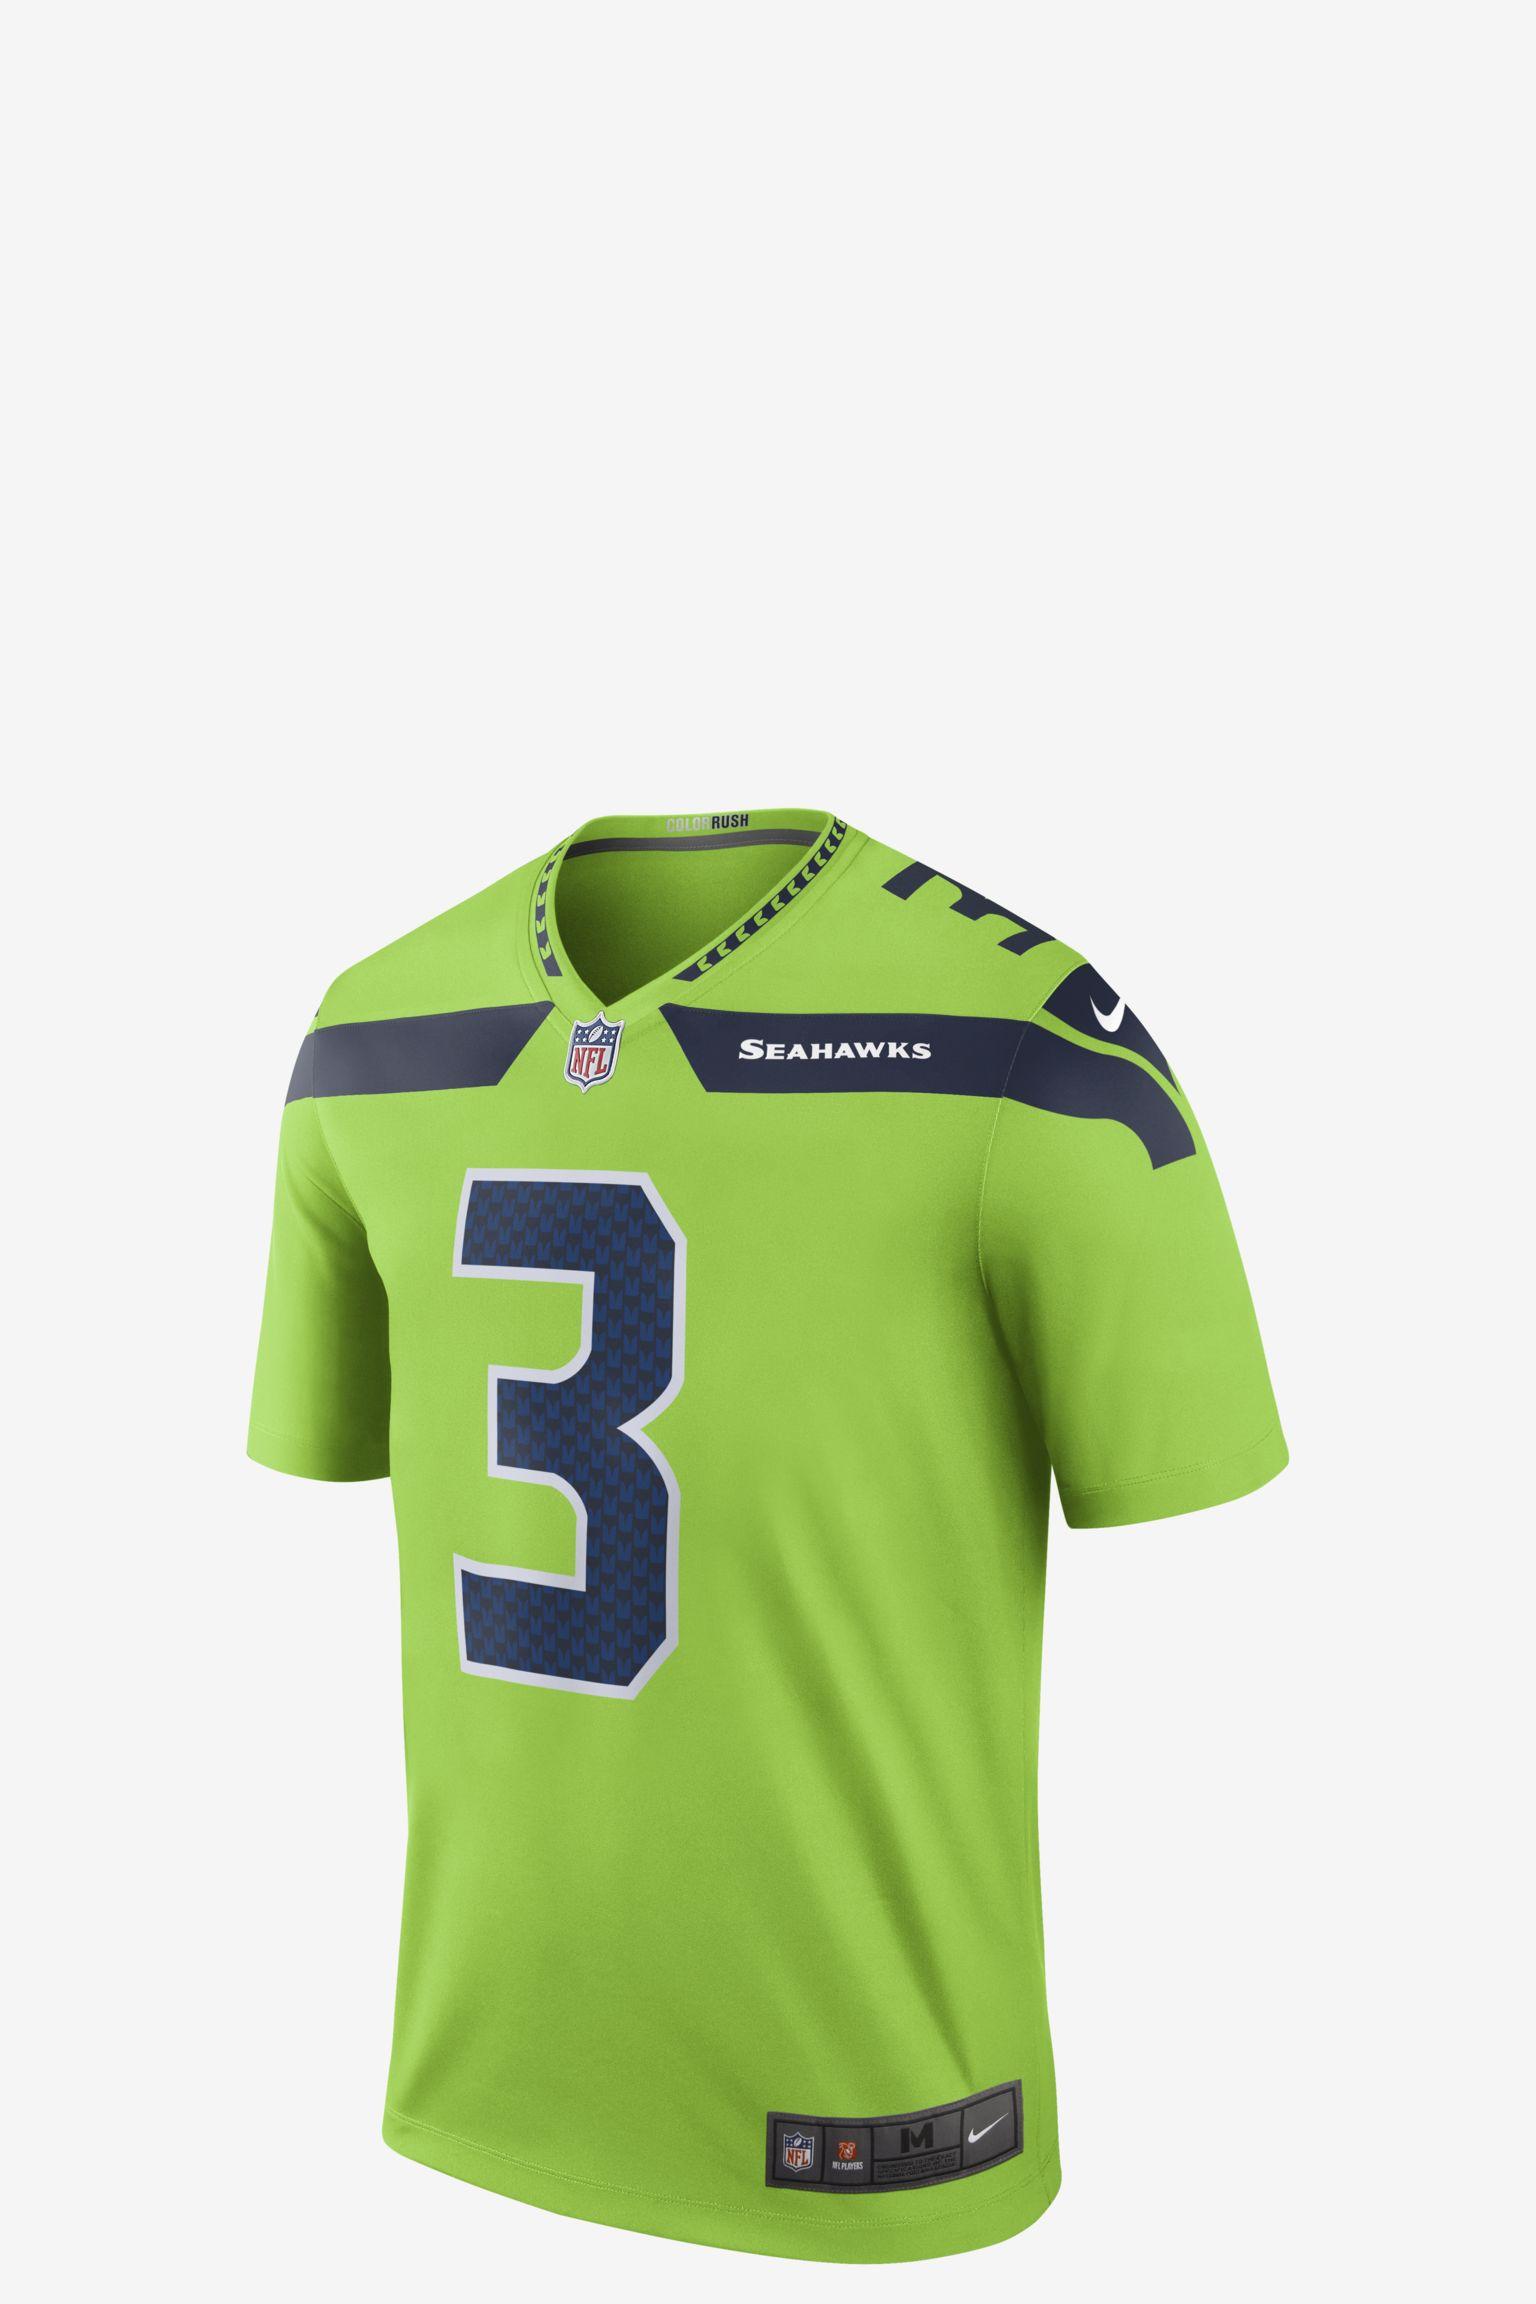 29df397ae How Do Nike NFL Jerseys Differ